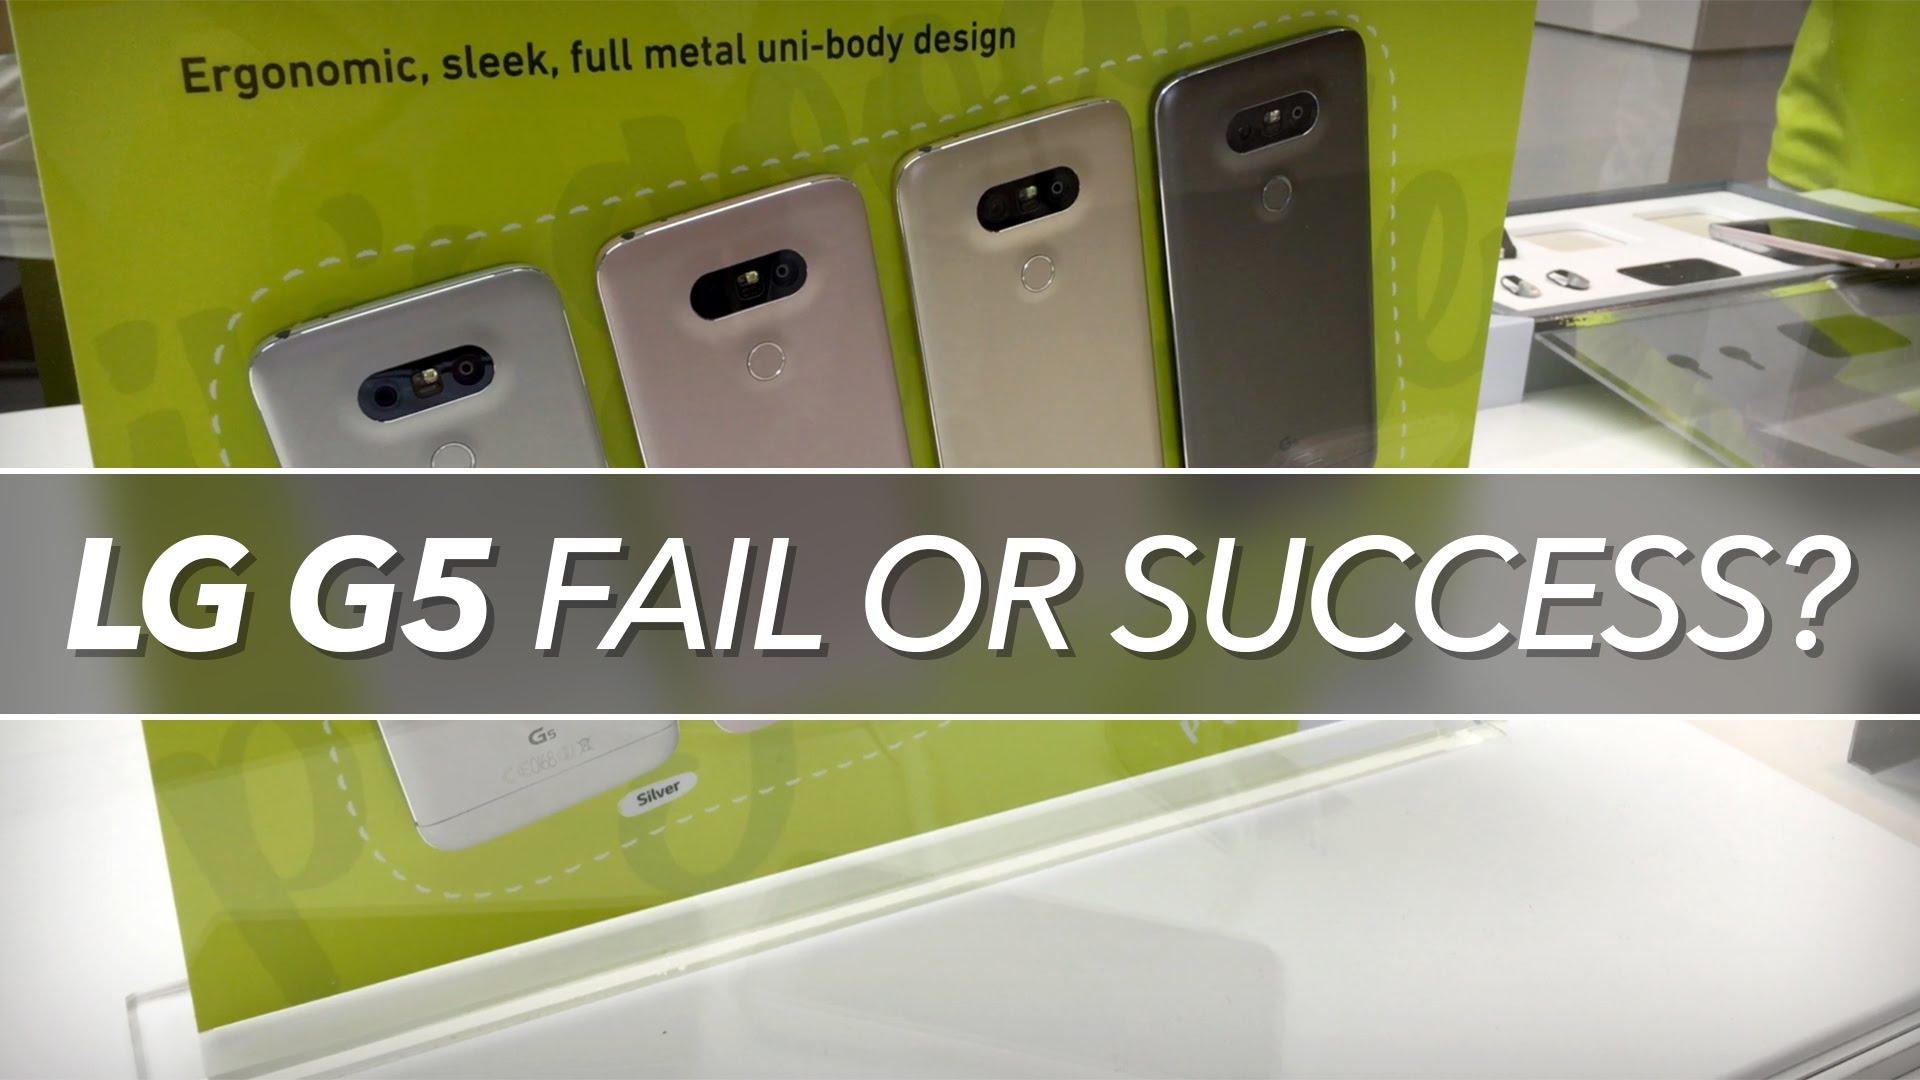 LG G5 In-Depth Hands On / Walkthrough